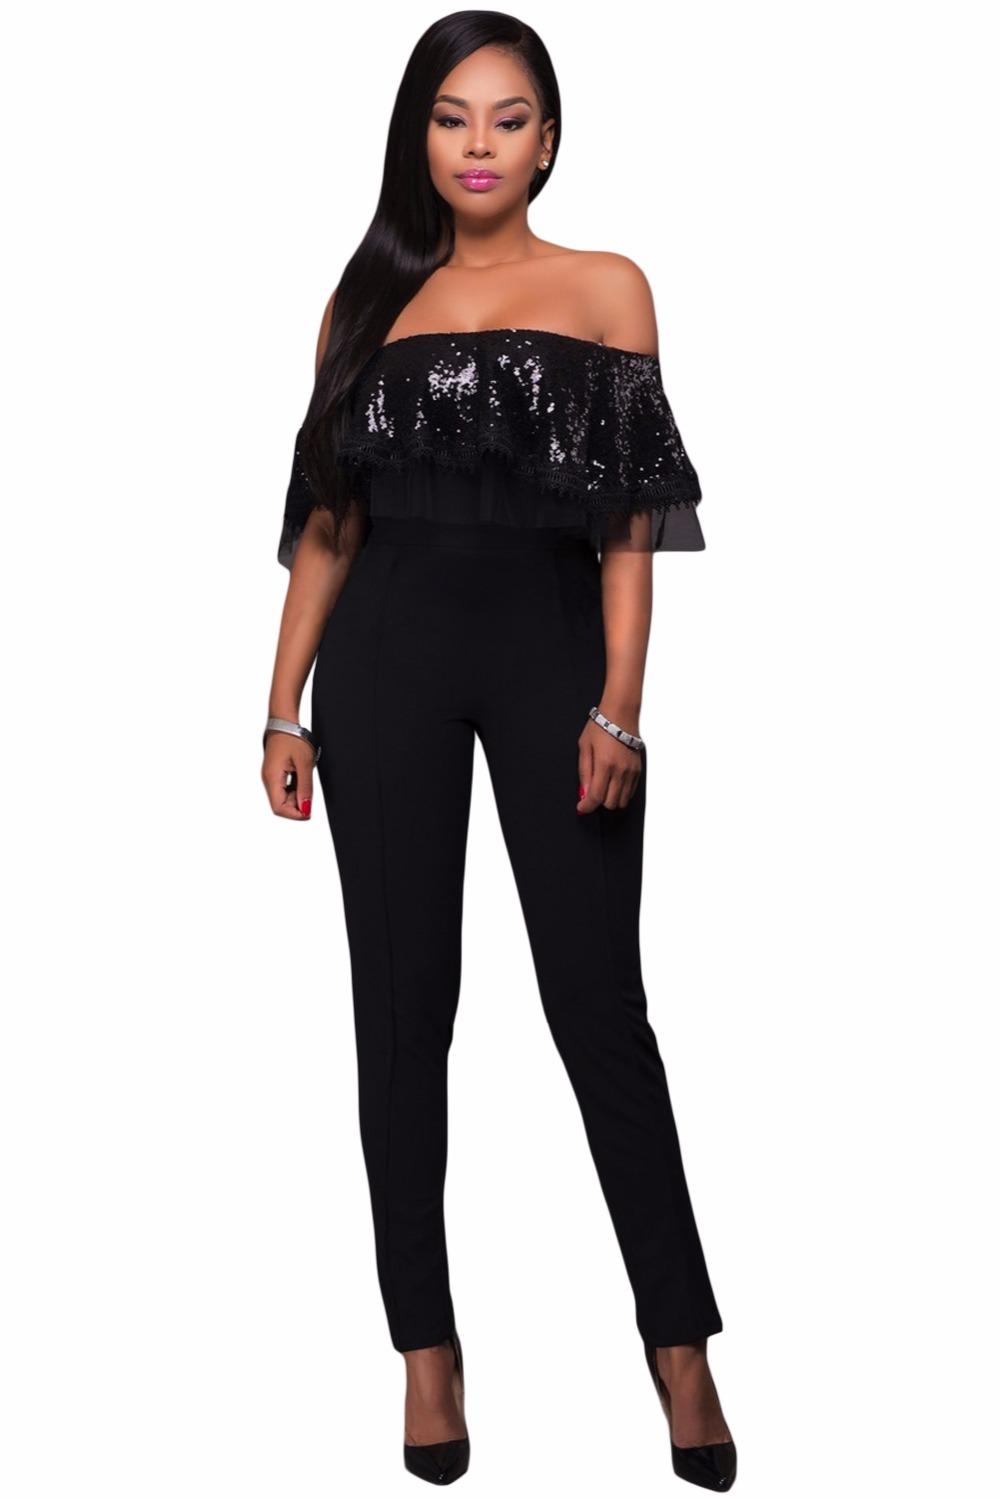 Black-Sequin-Ruffle-Top-Jumpsuit-LC64249-2-1